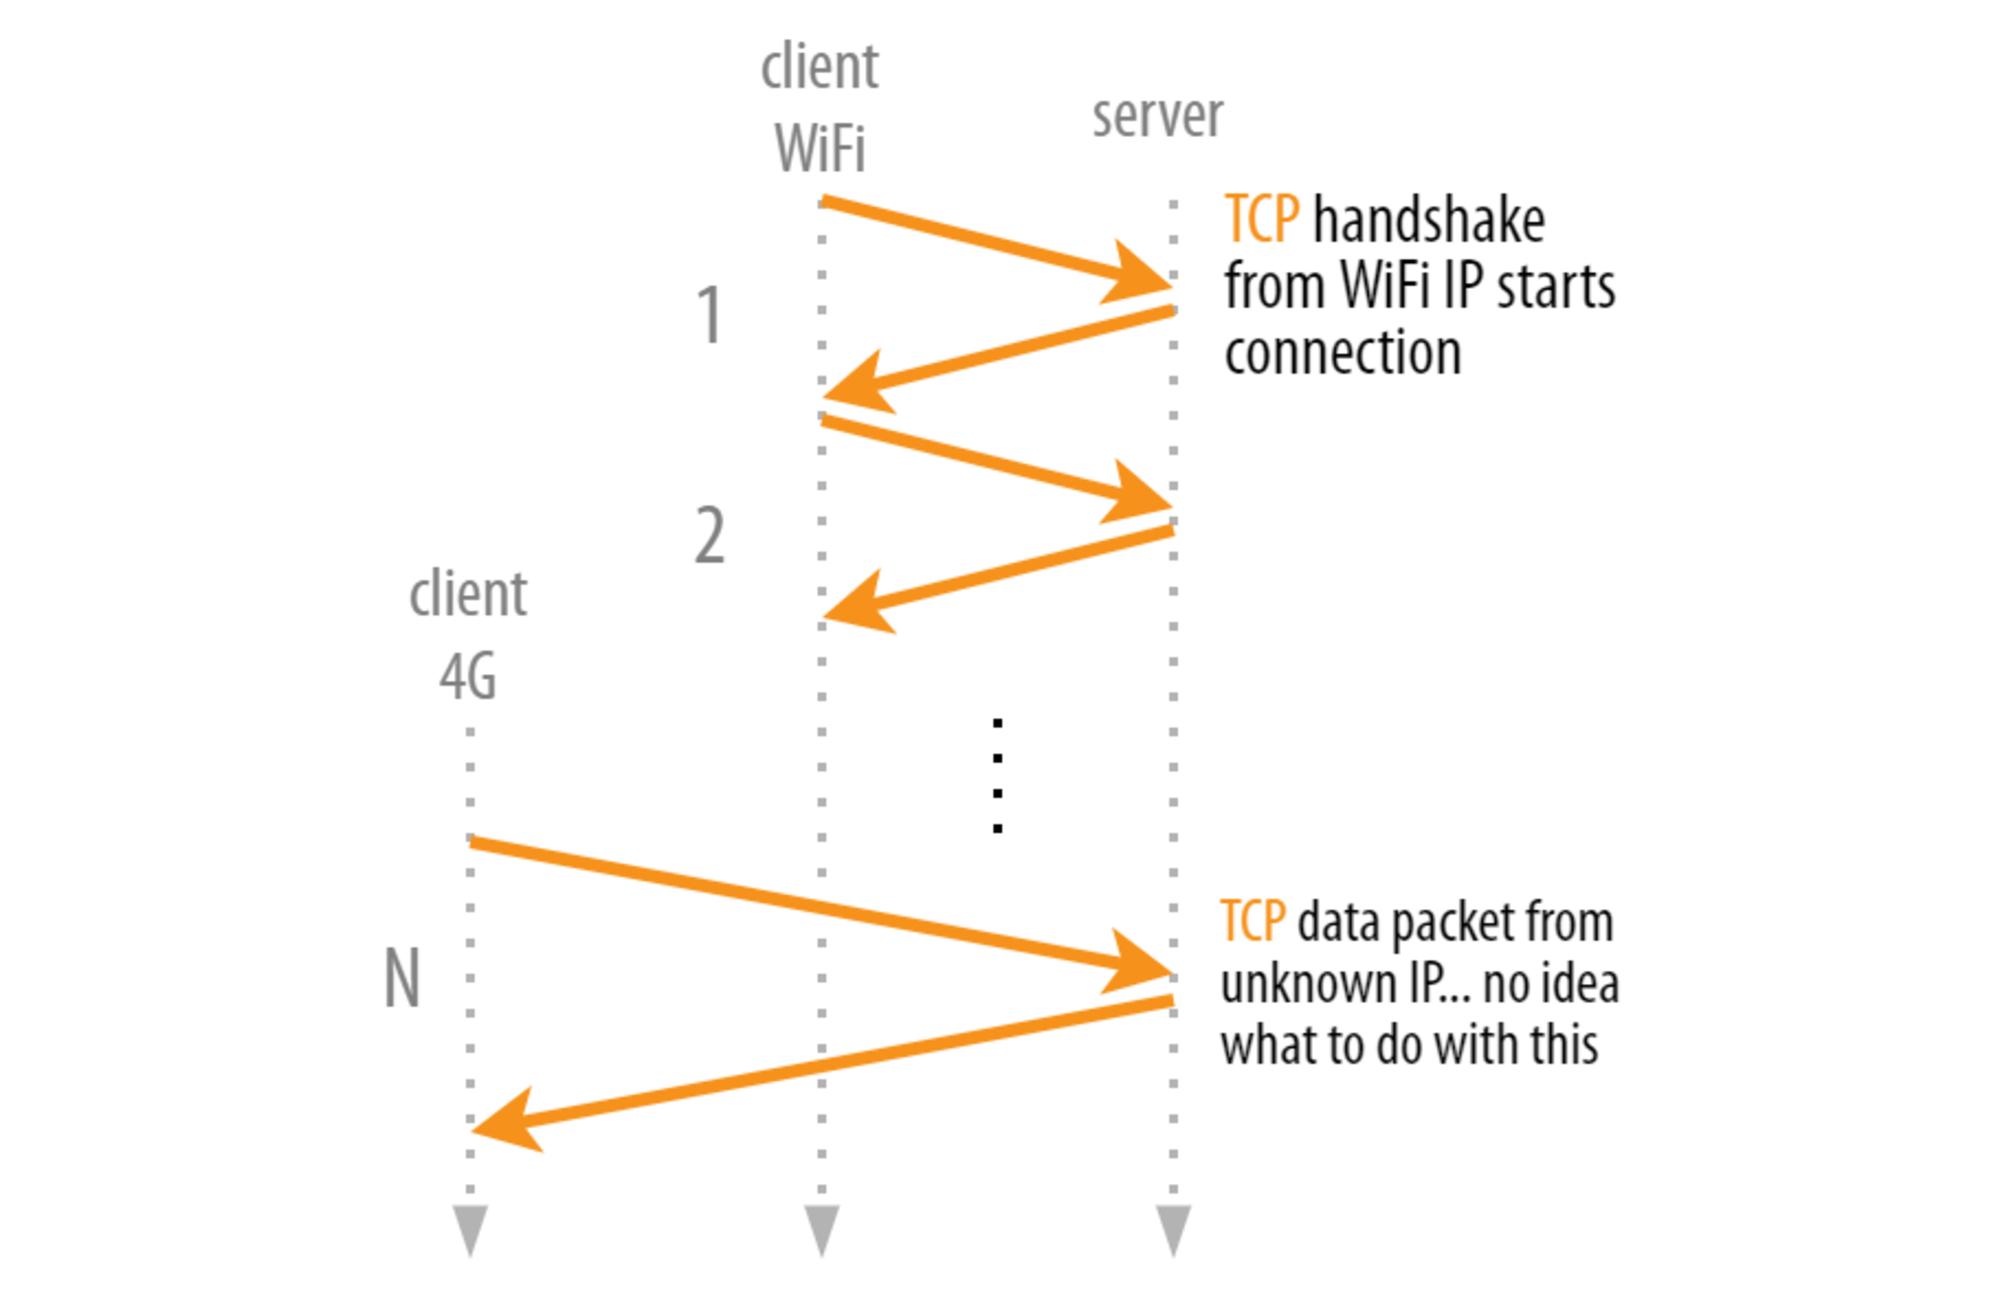 https://res.cloudinary.com/indysigner/image/fetch/f_auto,q_80/w_2000/https://cloud.netlifyusercontent.com/assets/344dbf88-fdf9-42bb-adb4-46f01eedd629/9413b221-47e9-427b-b958-b0e62fe7f681/1-migration-tcp.png